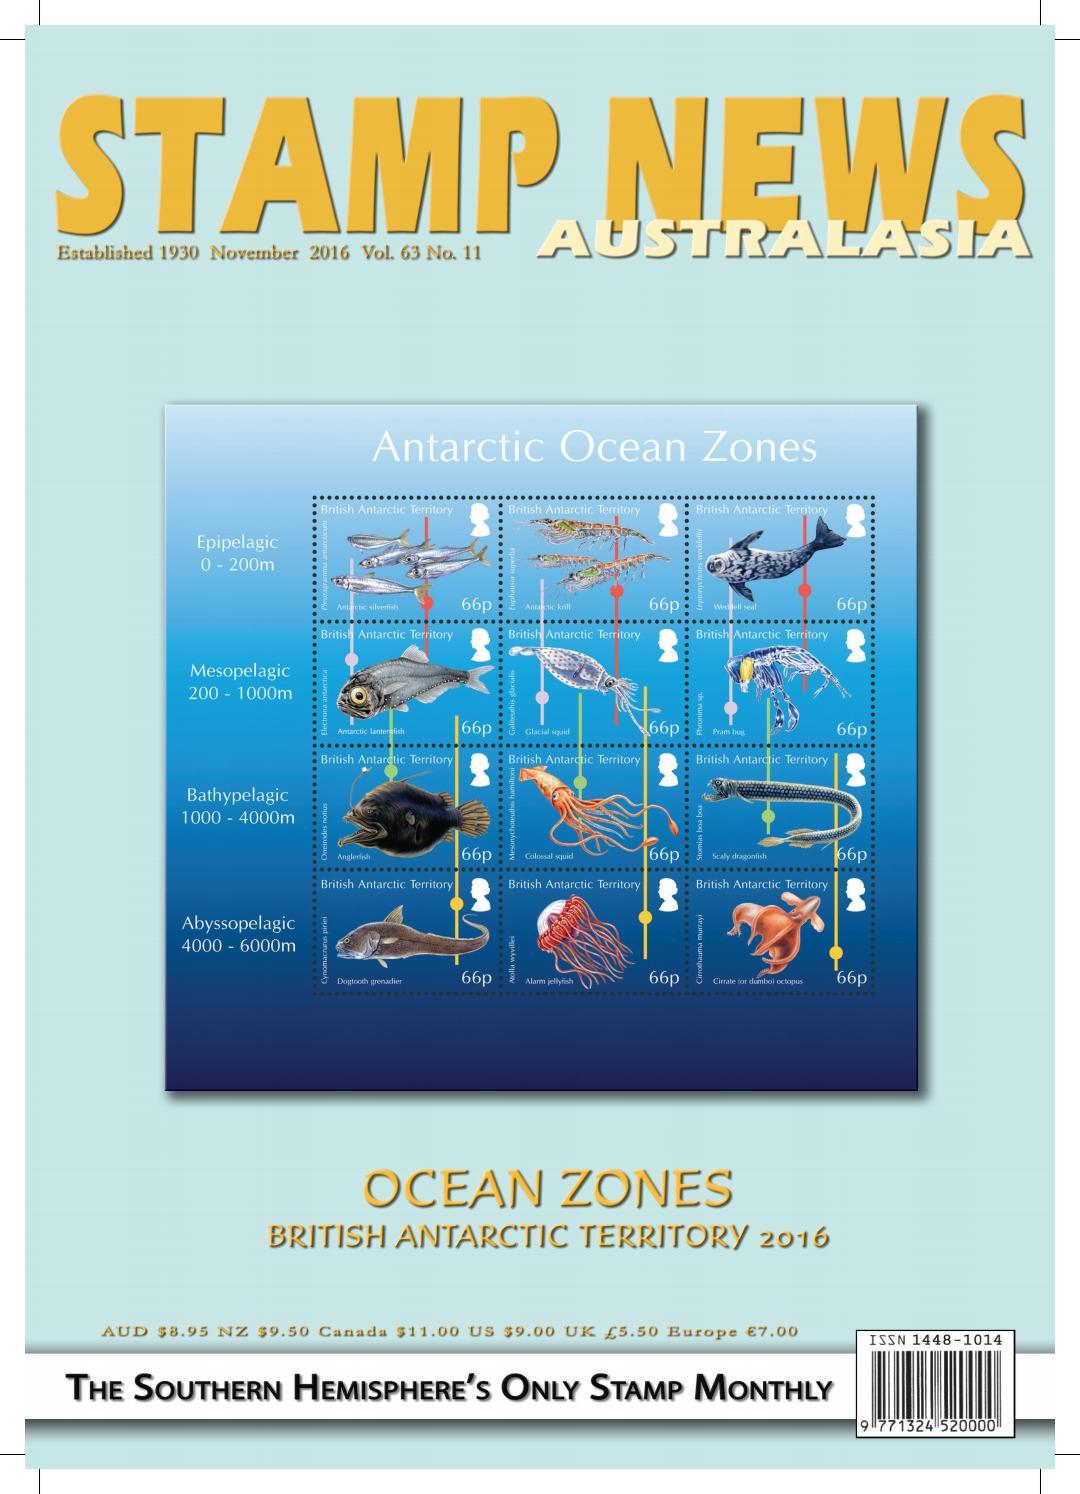 Stamp News Australasia - November 2016 by Stamp News Australasia - issuu